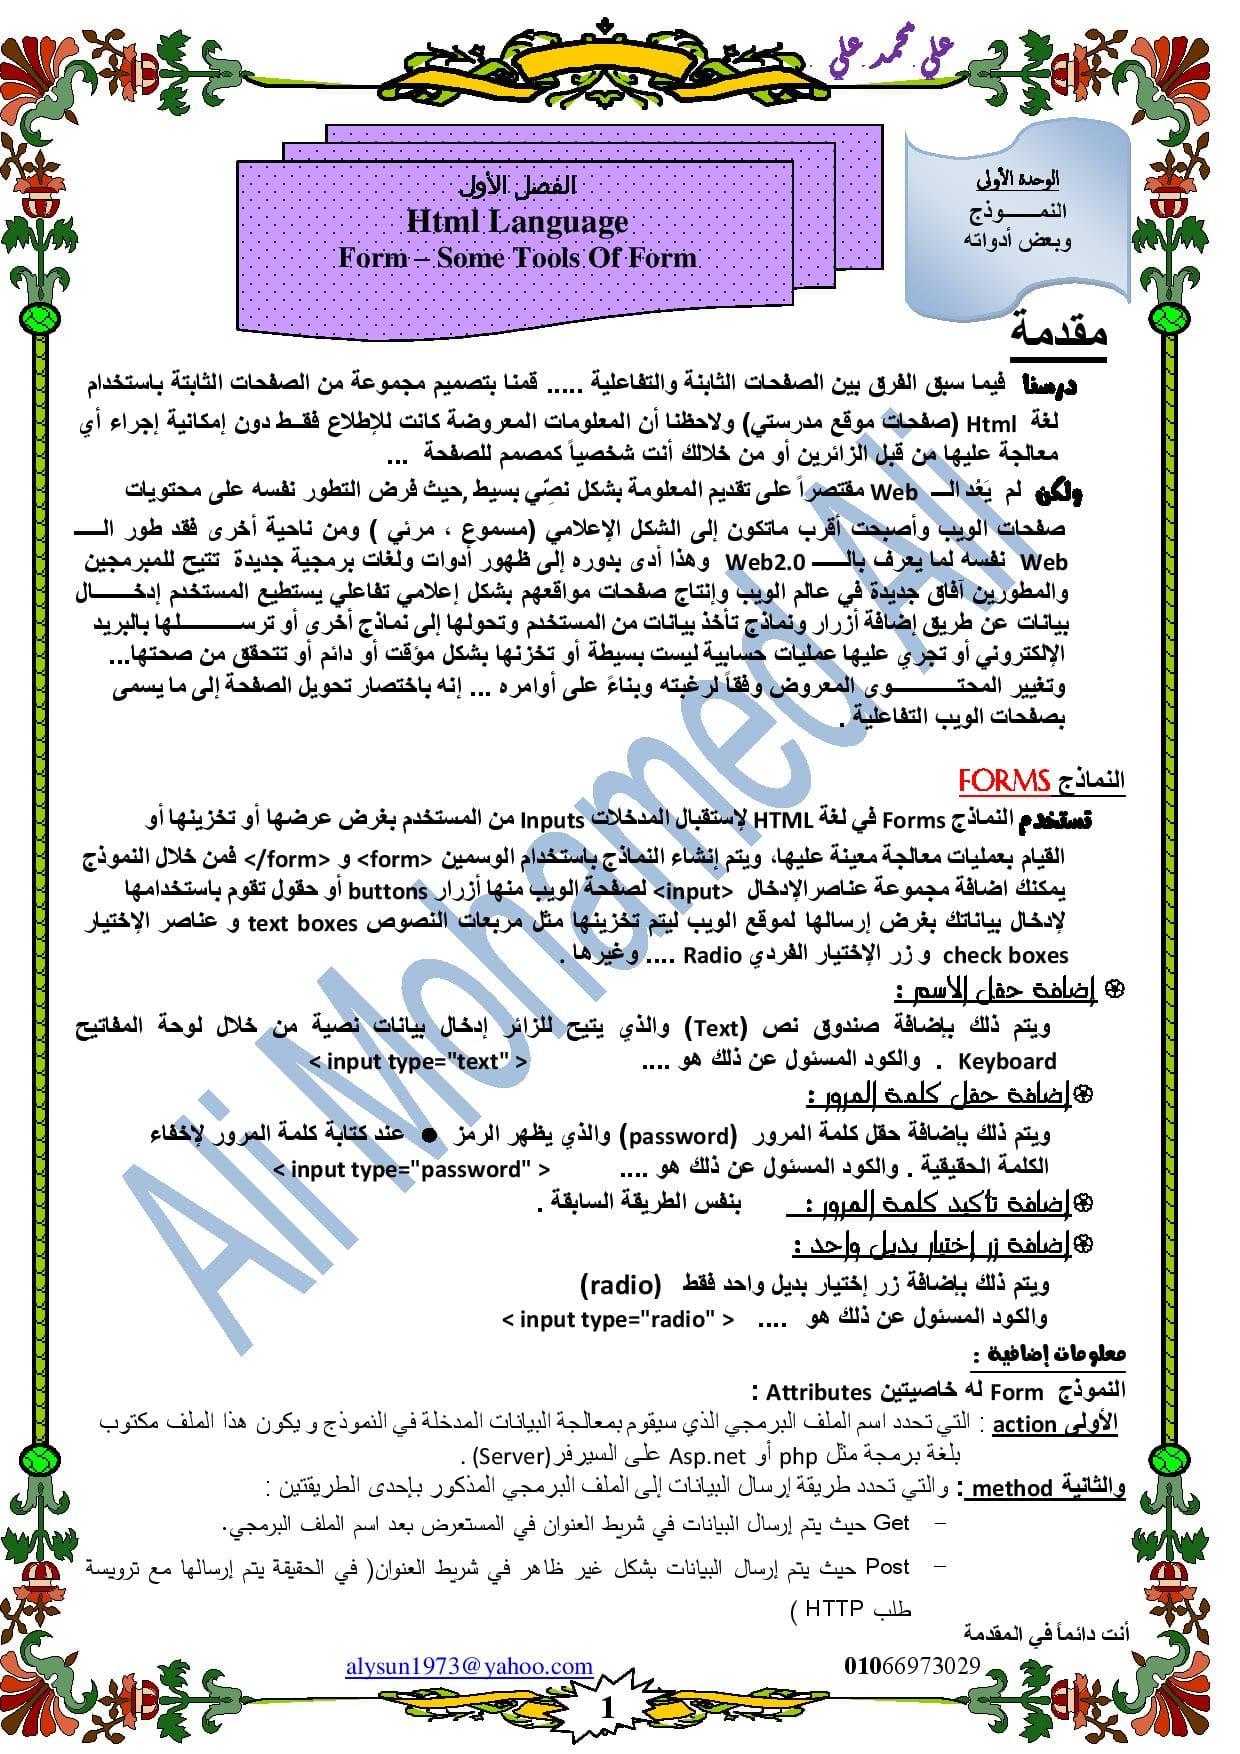 exam-eg.com_1489861244441.jpg